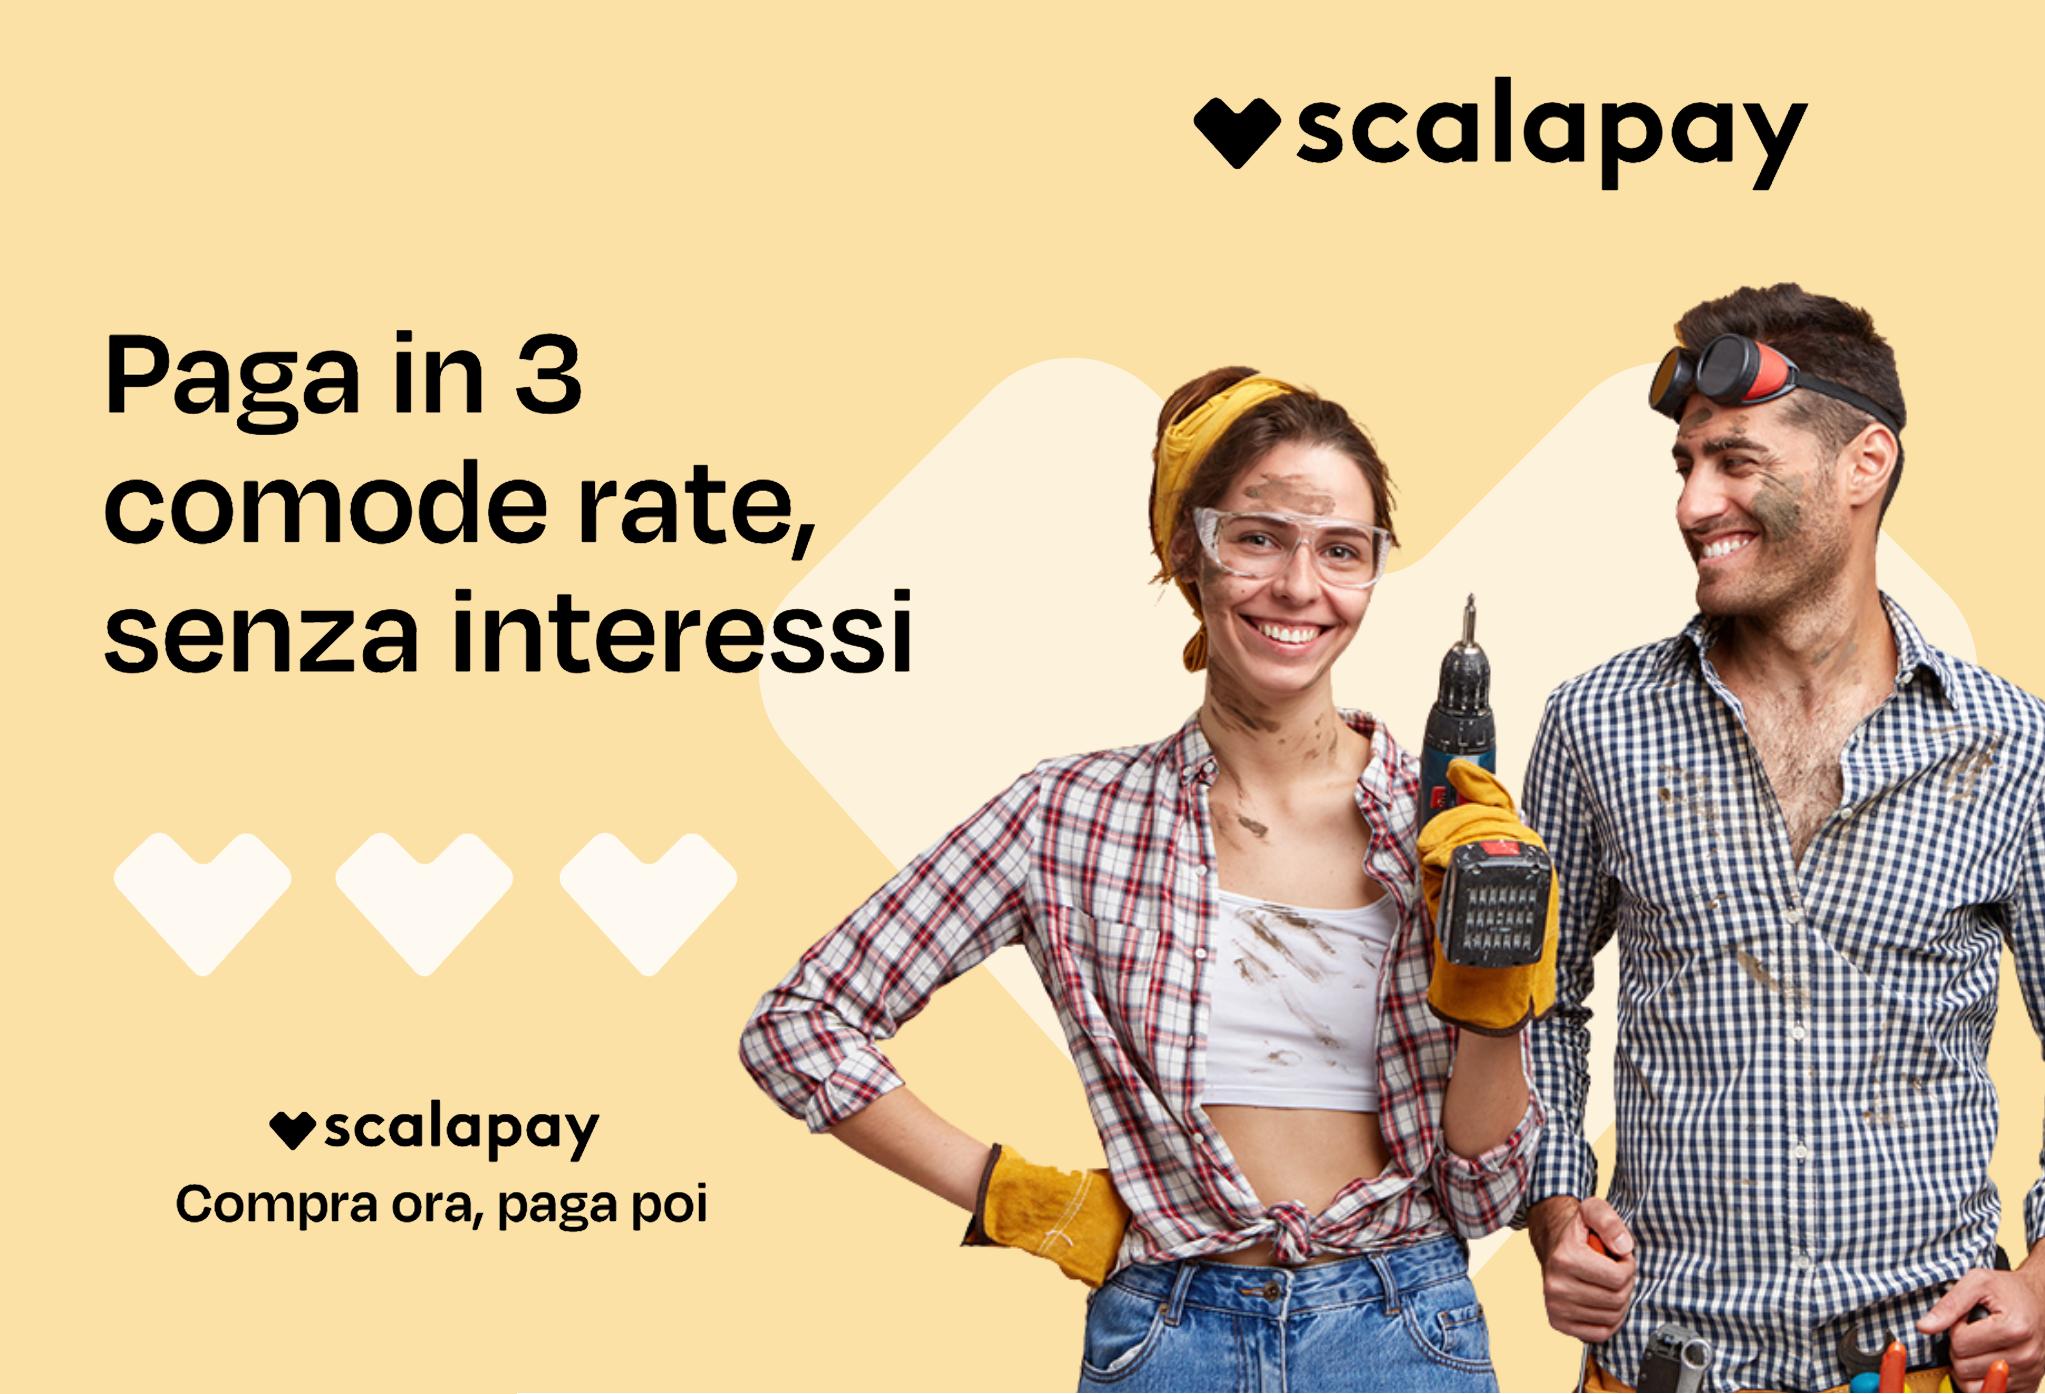 Scalapay